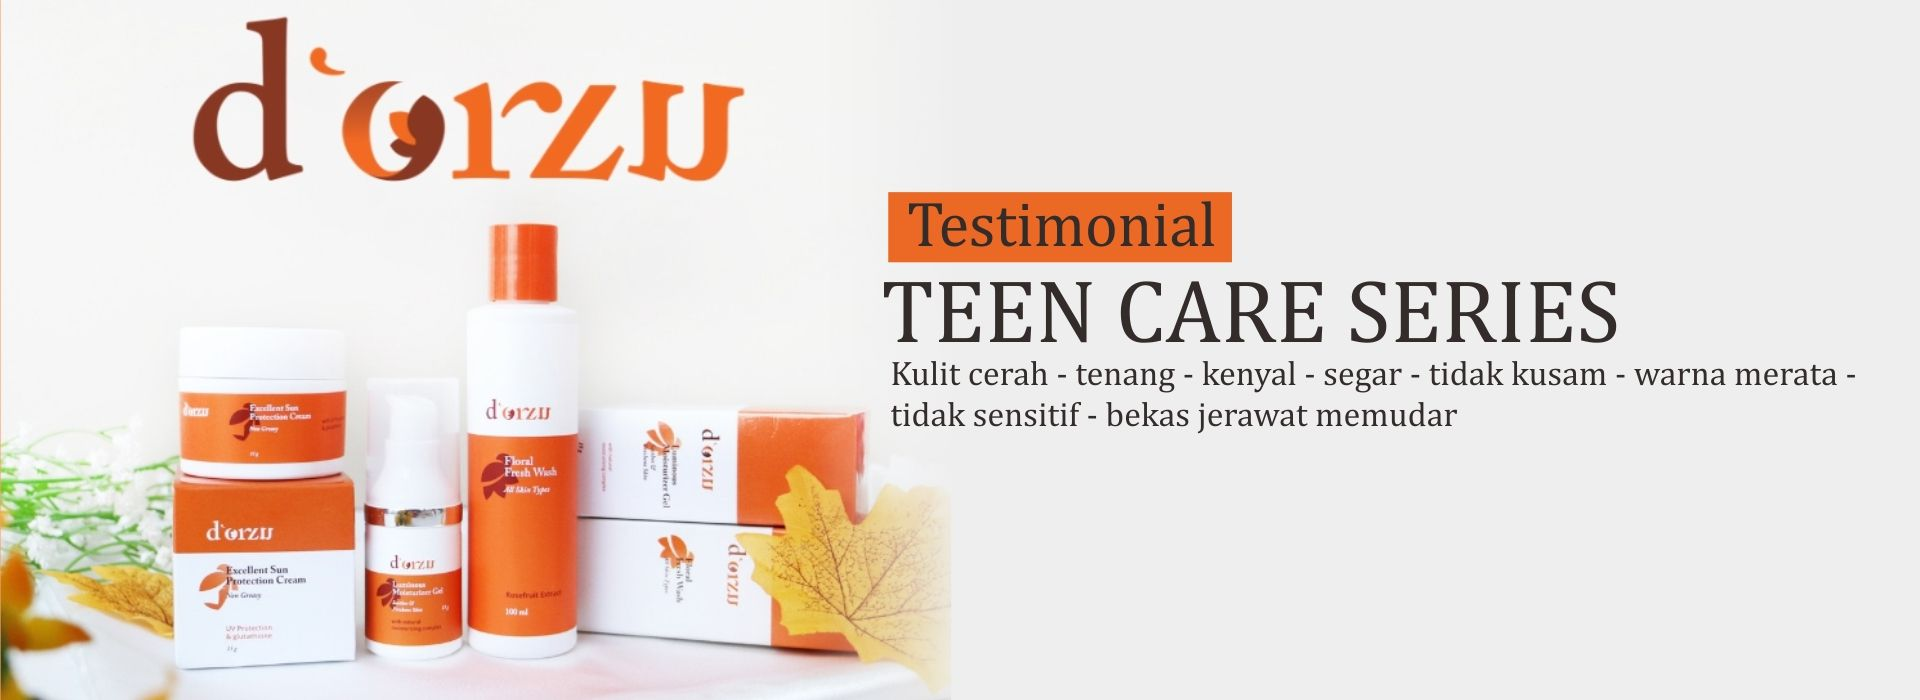 testimonial-teen-care-series